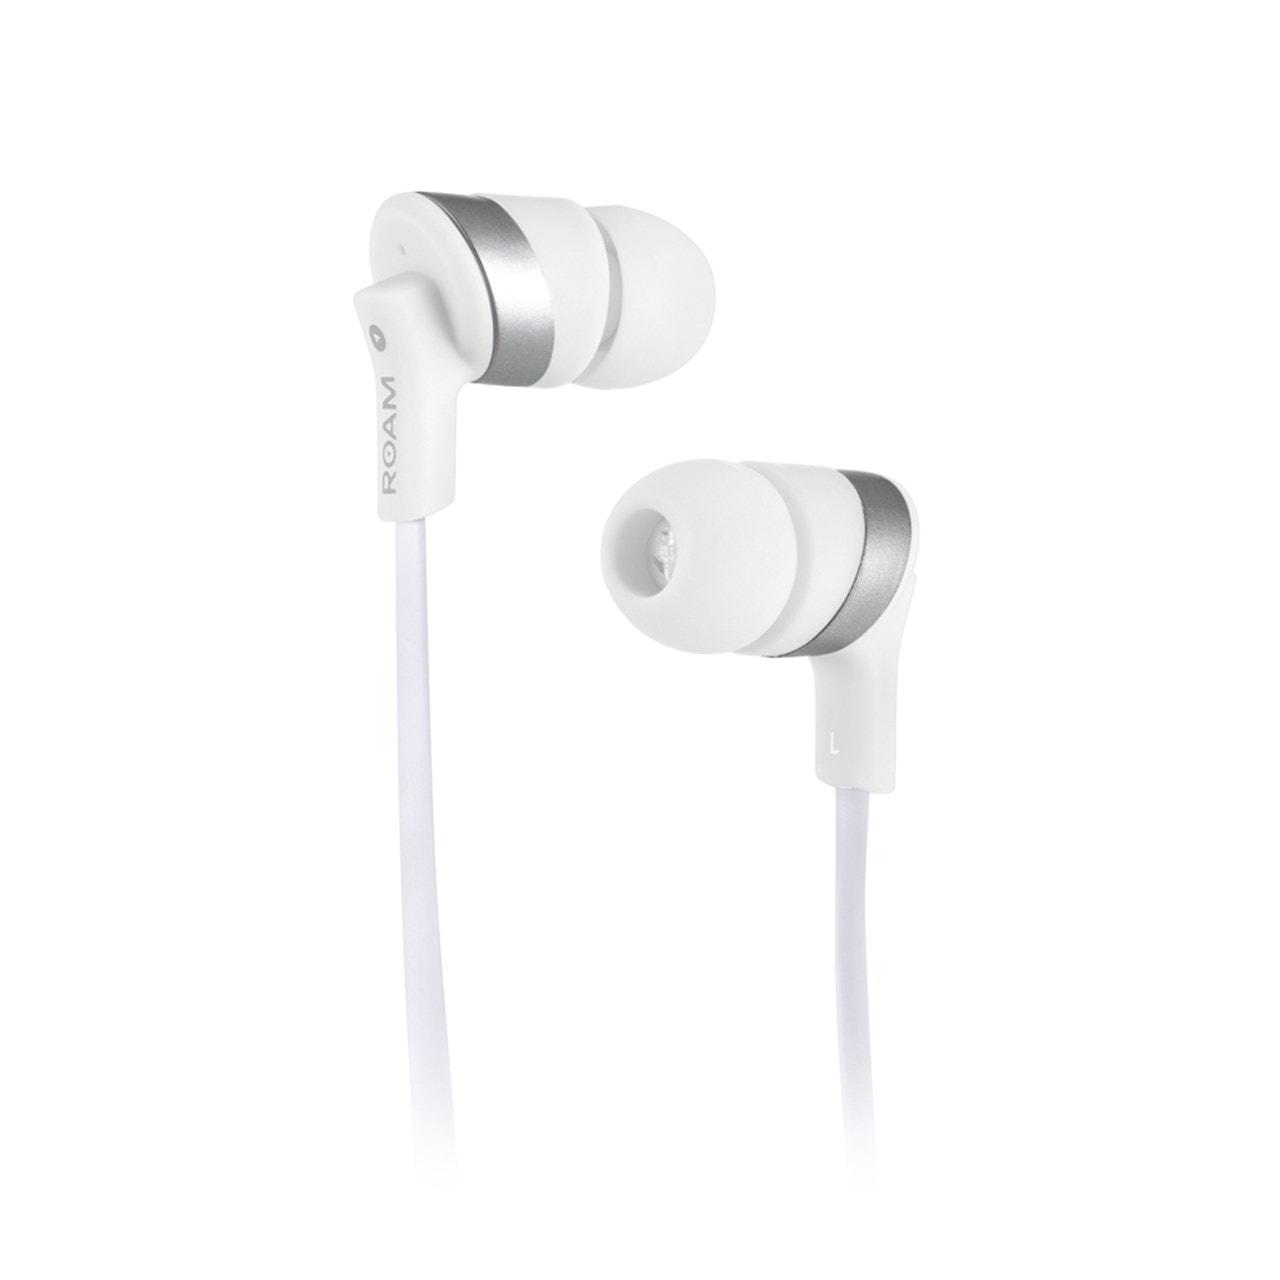 Roam Colours White Bluetooth Earphones (hmv Exclusive) - 1